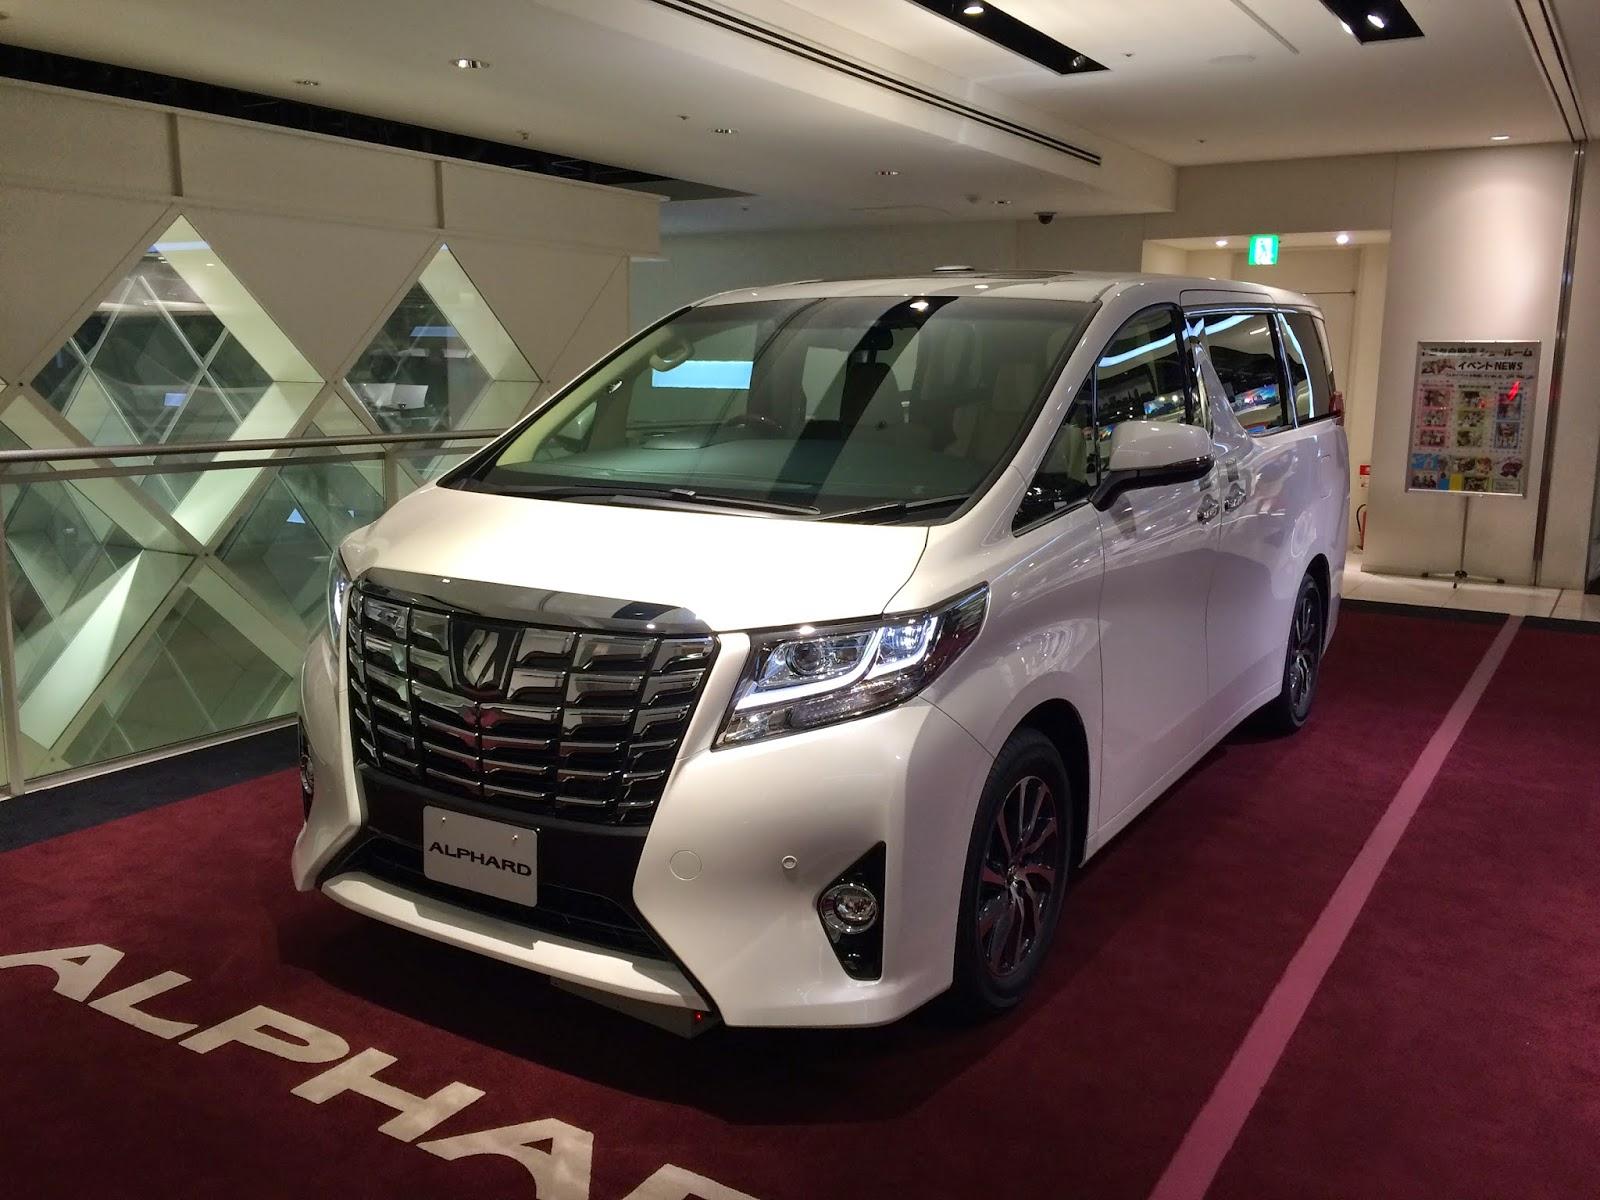 Harga All New Alphard Executive Lounge Mobil Agya Trd Toyota Melucurkan Tembus Rp 15 M